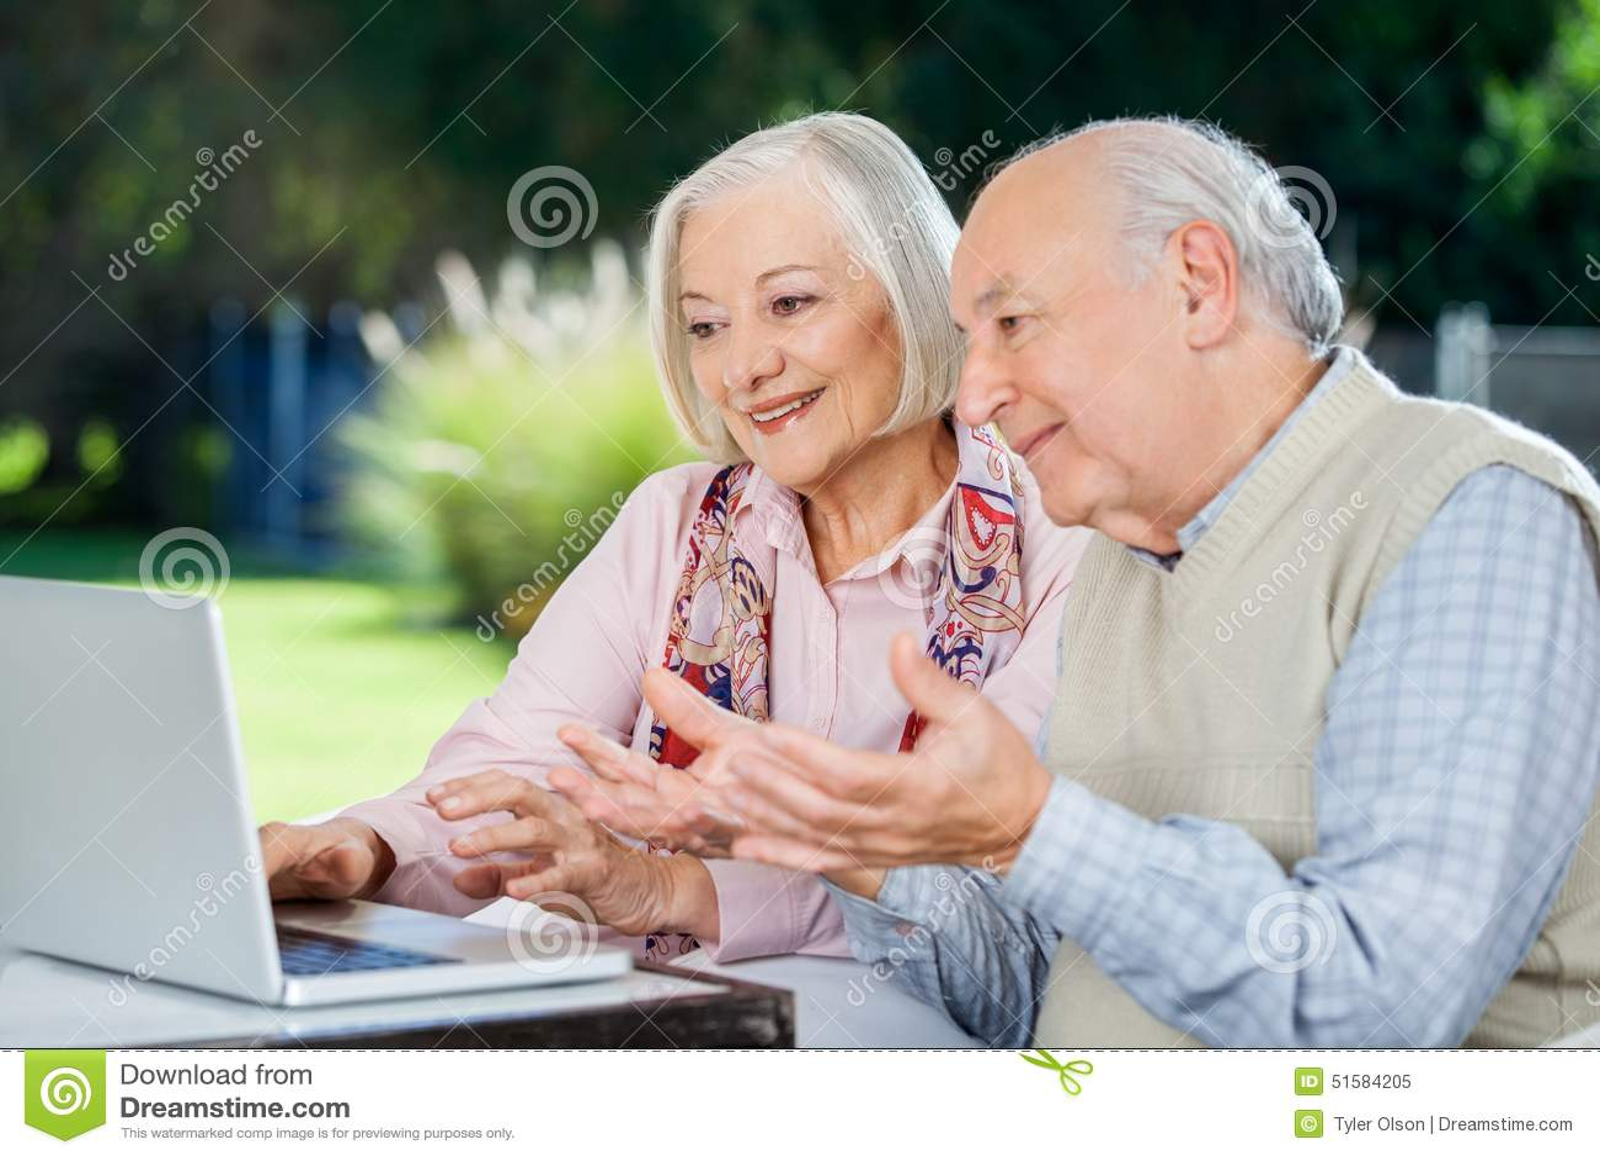 Älteres Paar-Video, das auf Laptop plaudert